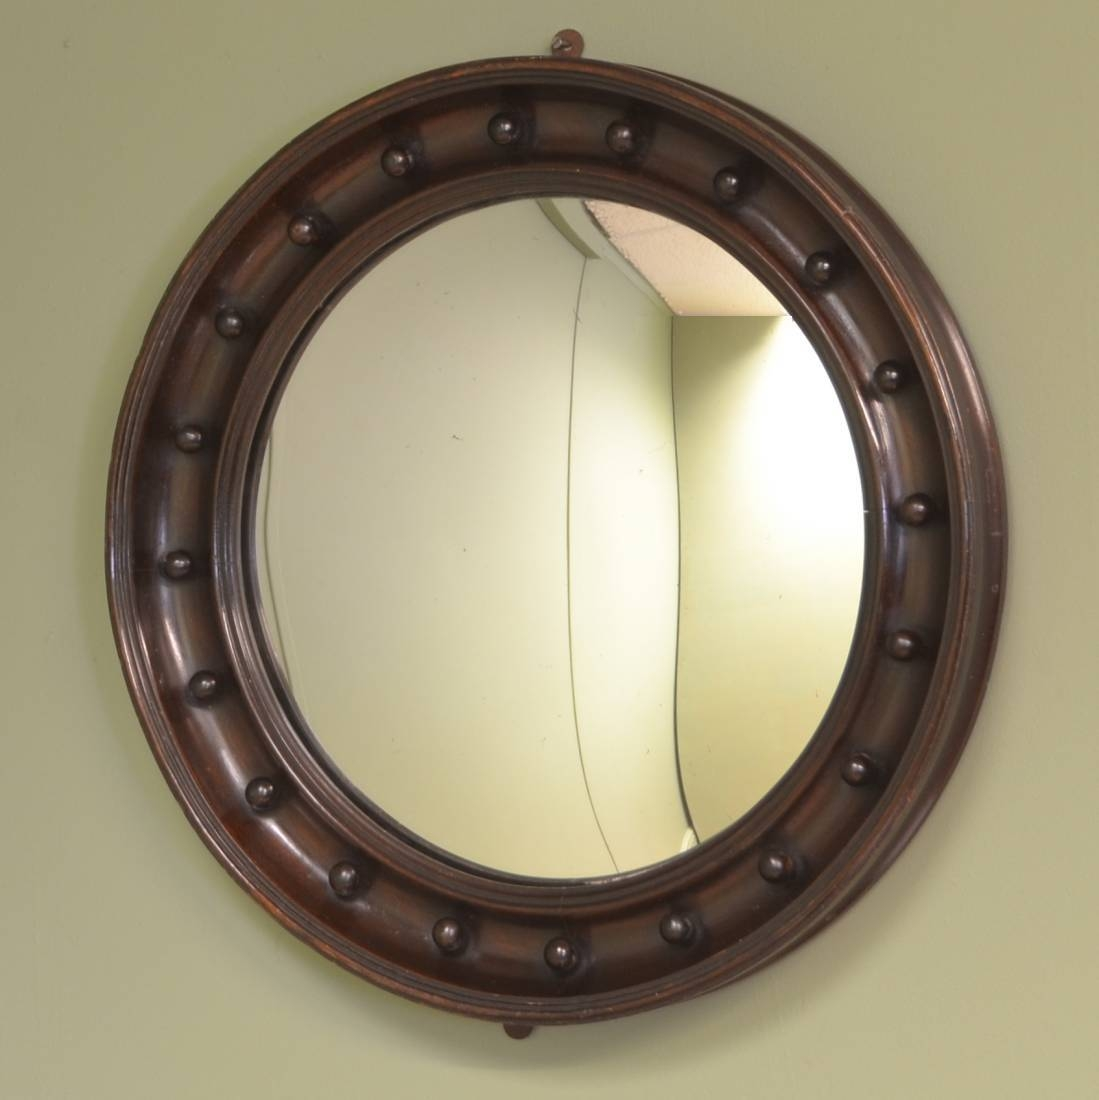 Decorative Edwardian Antique Convex Mirror - Antiques World with Decorative Convex Mirrors (Image 10 of 25)